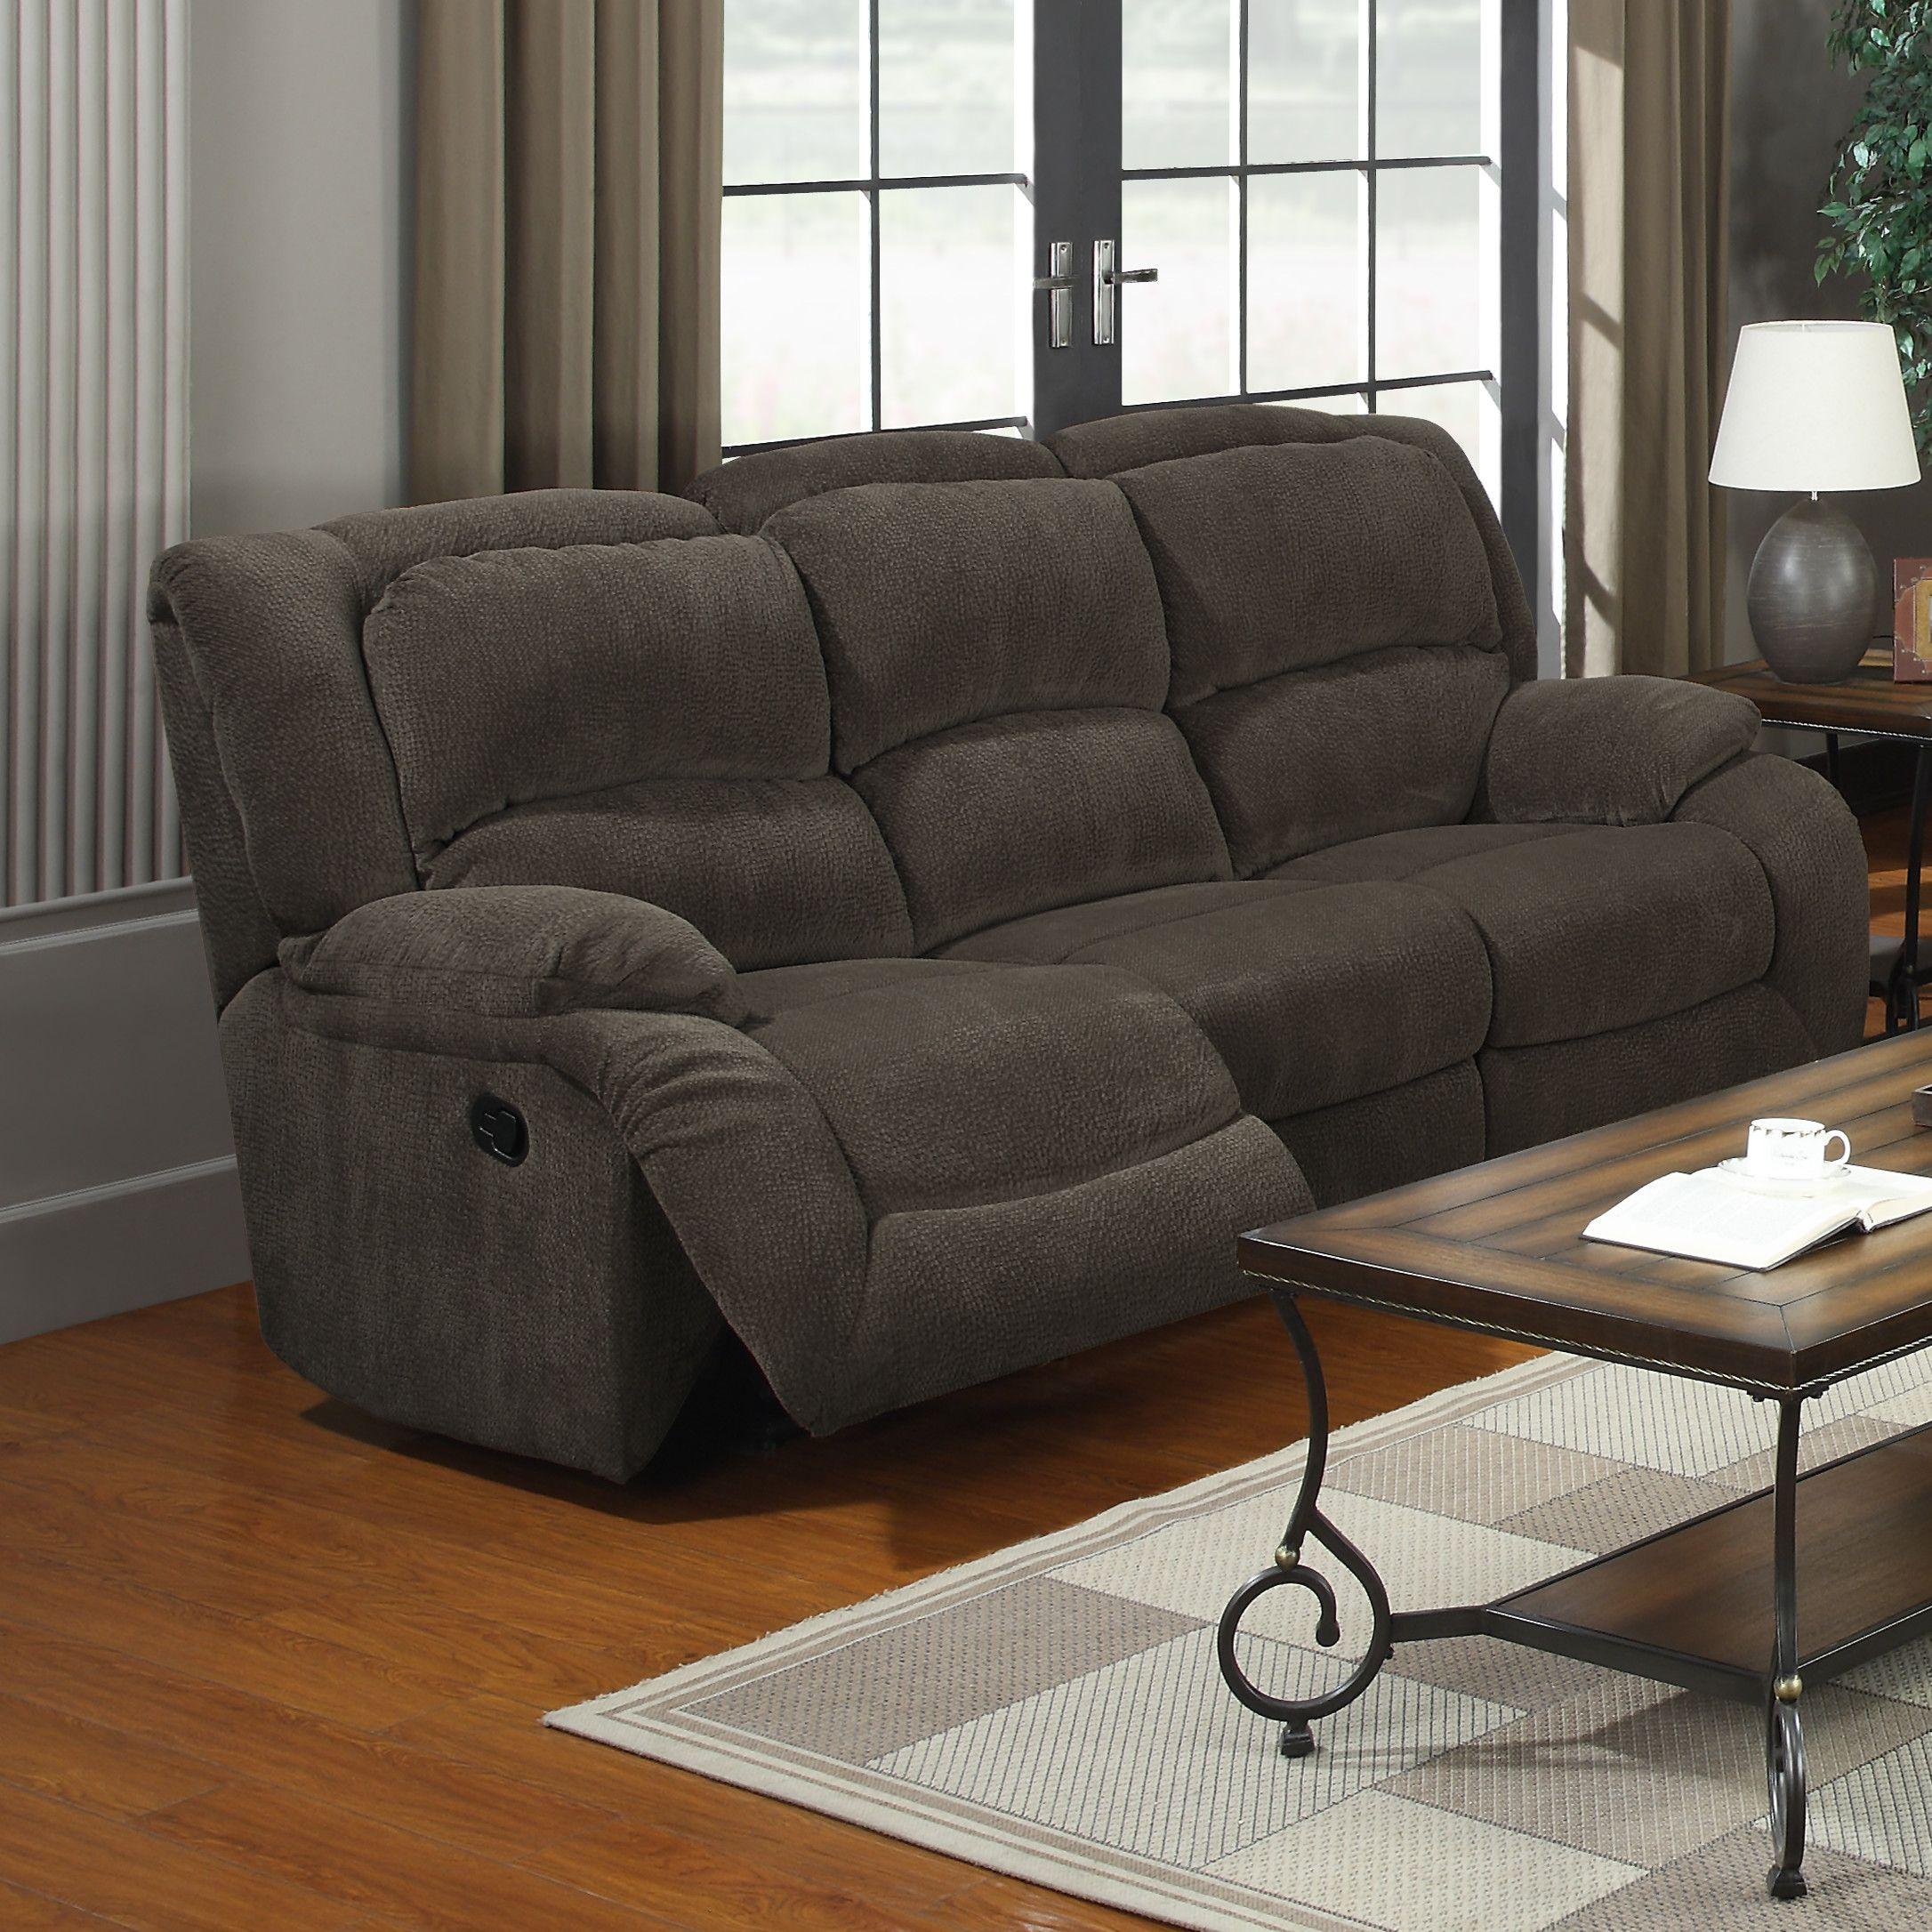 $599.99 Red Barrel Studio® Amalthea Reclining Sofa | Couches ...